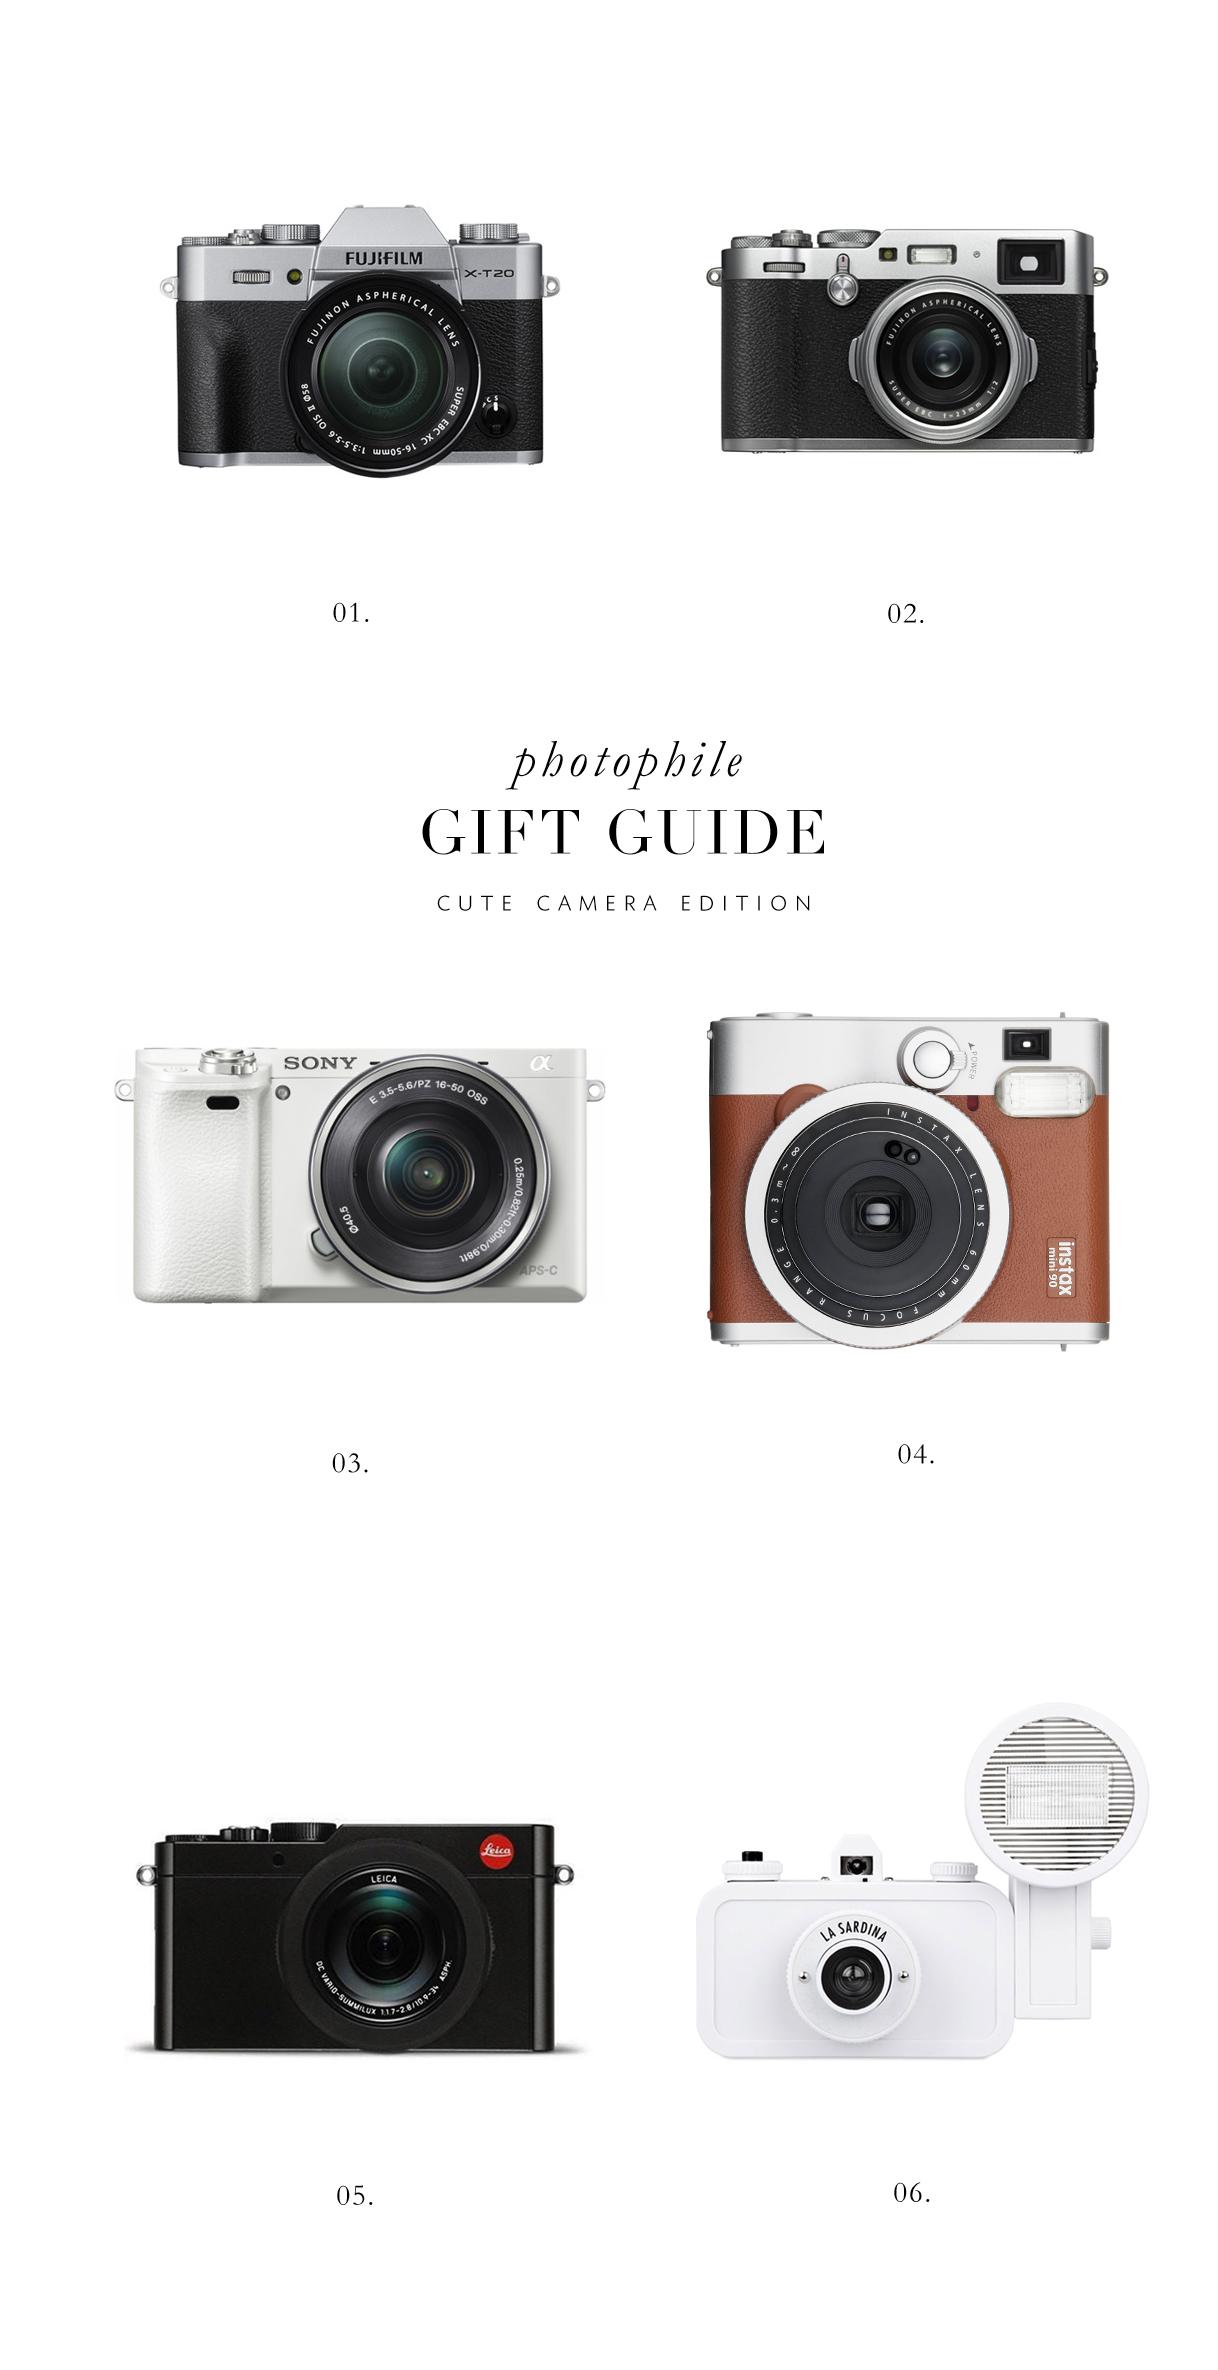 cute camera gift guide via besottedblog i